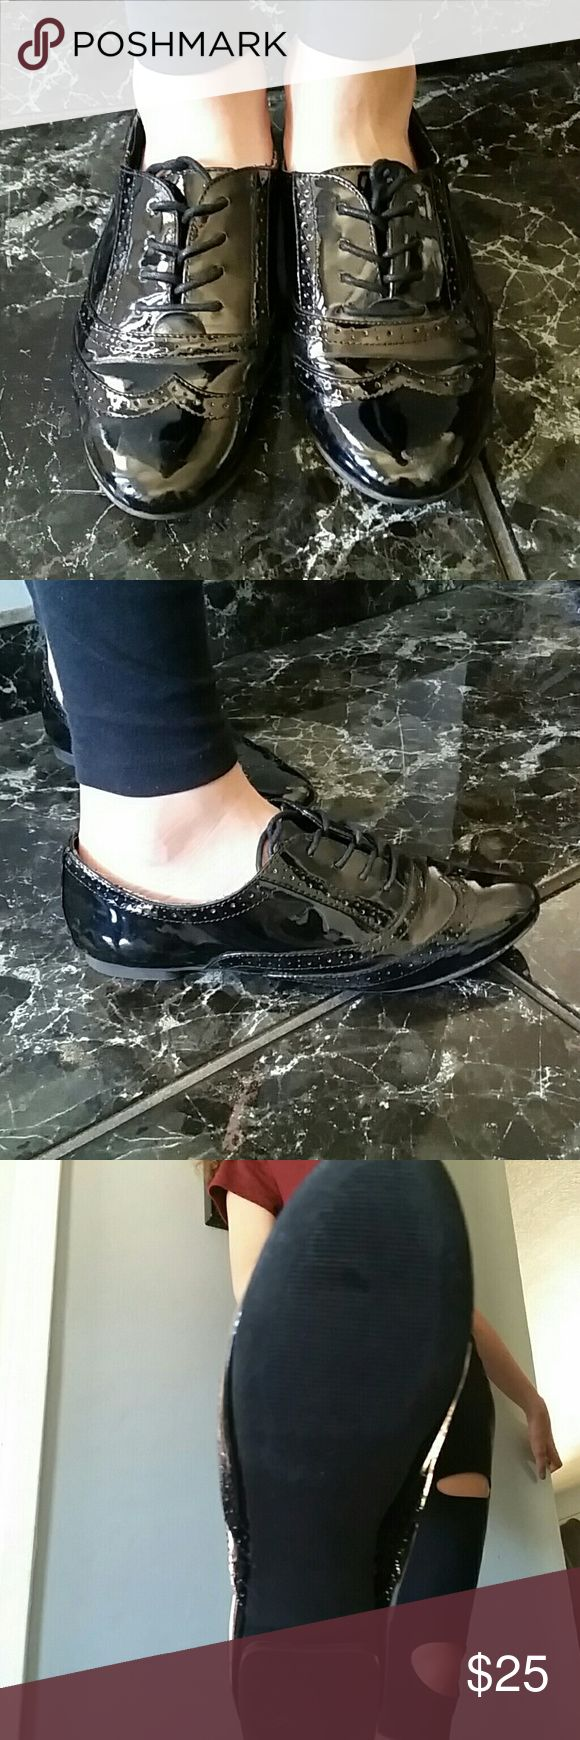 Black patent leather shoes Black patent leather shoes Aldo Shoes Flats & Loafers